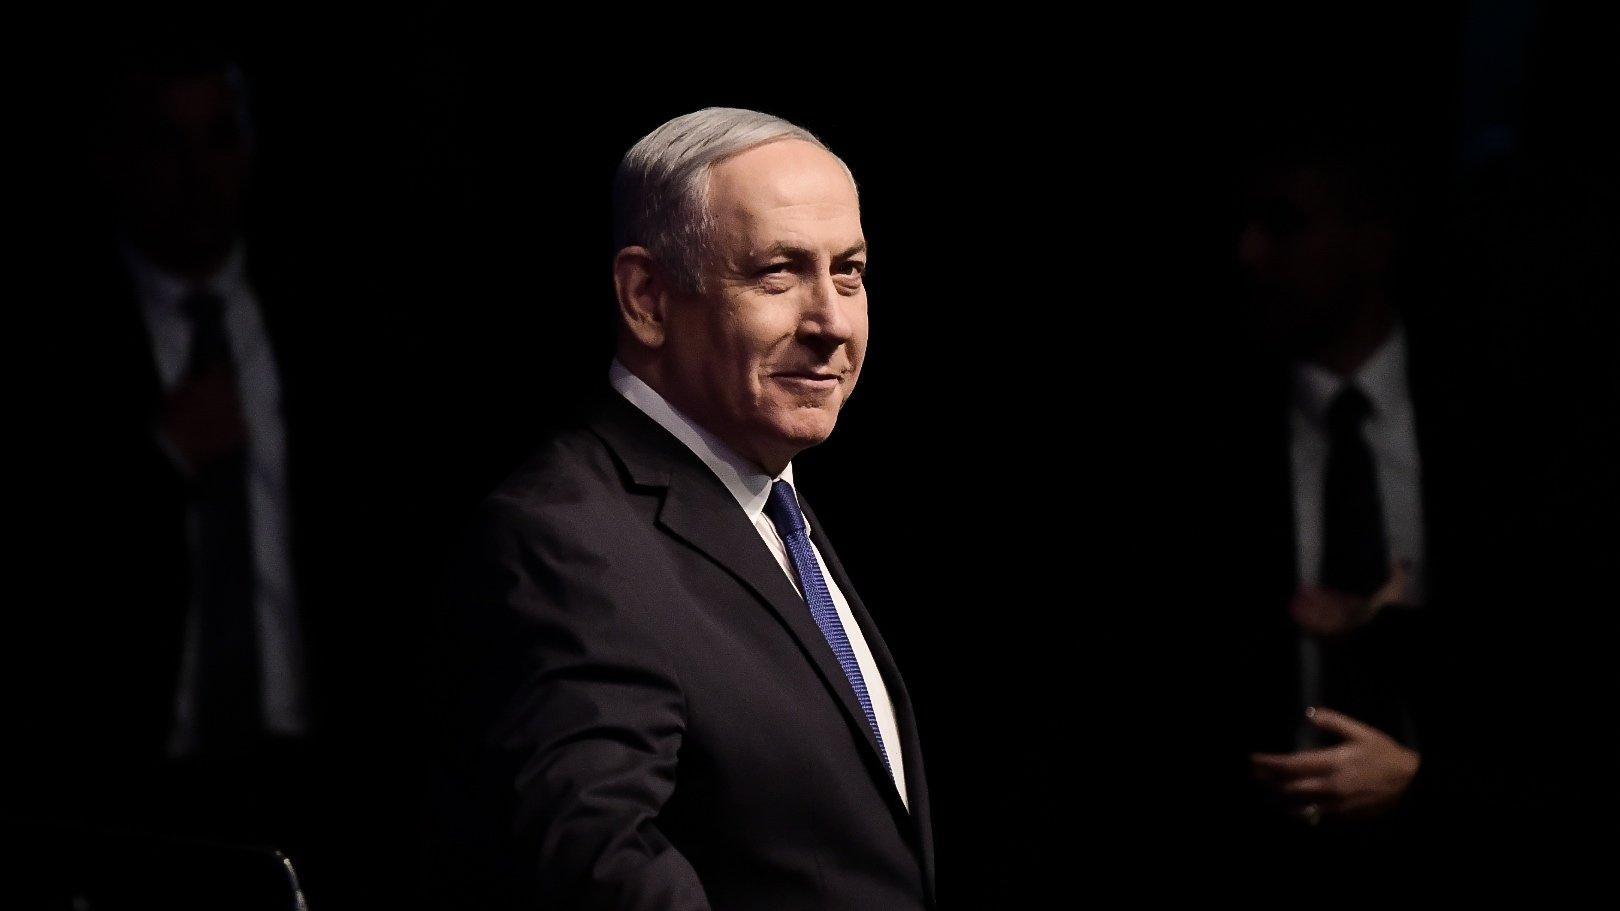 Netanyahu suggests so-called microchip for Israeli kids returning to school.